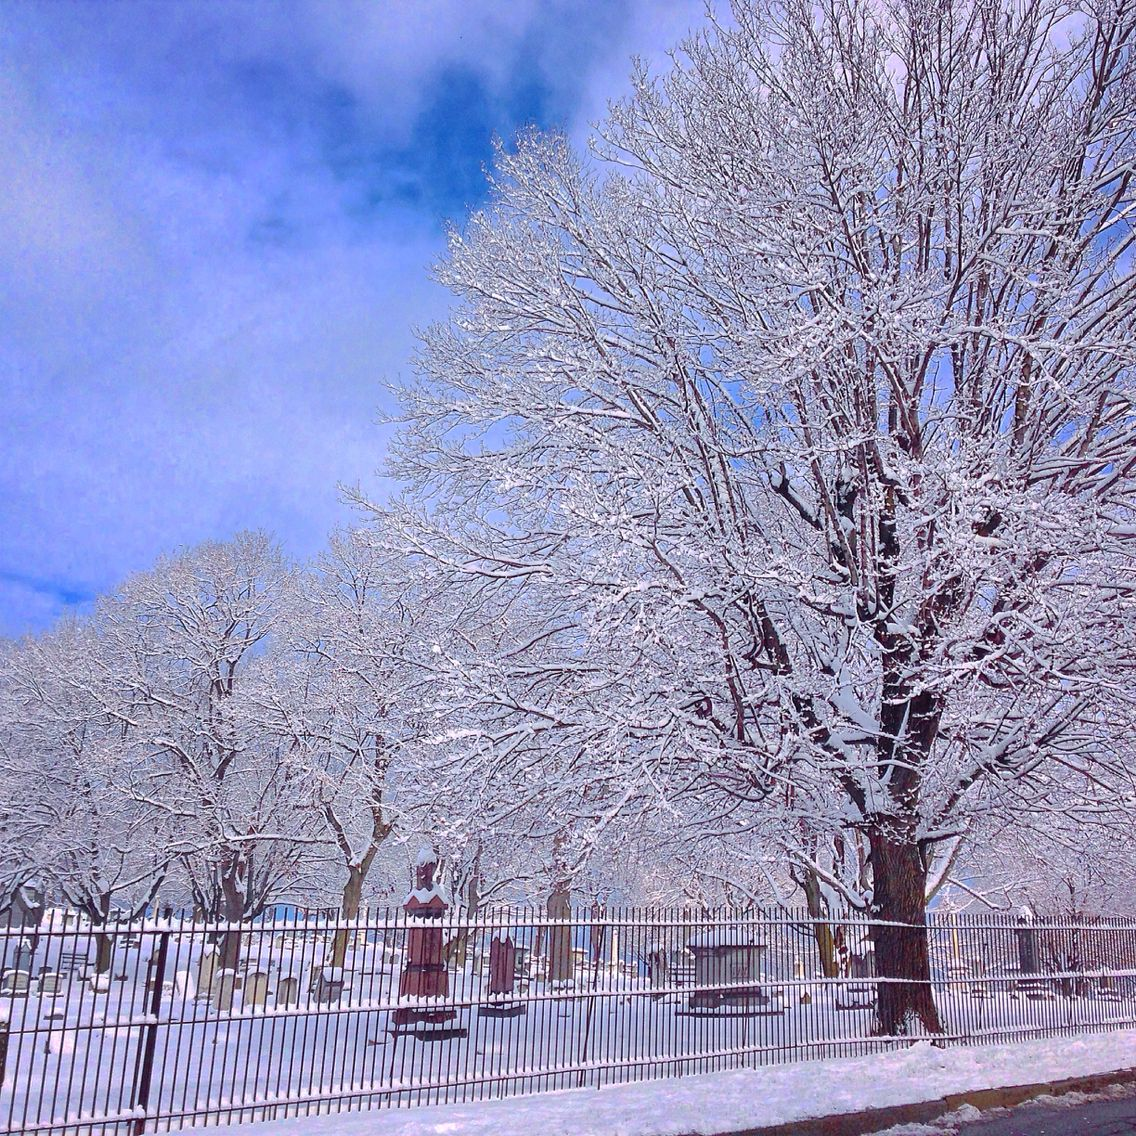 Snowy, cemetary in Altoona, Pa. January 23, 2015